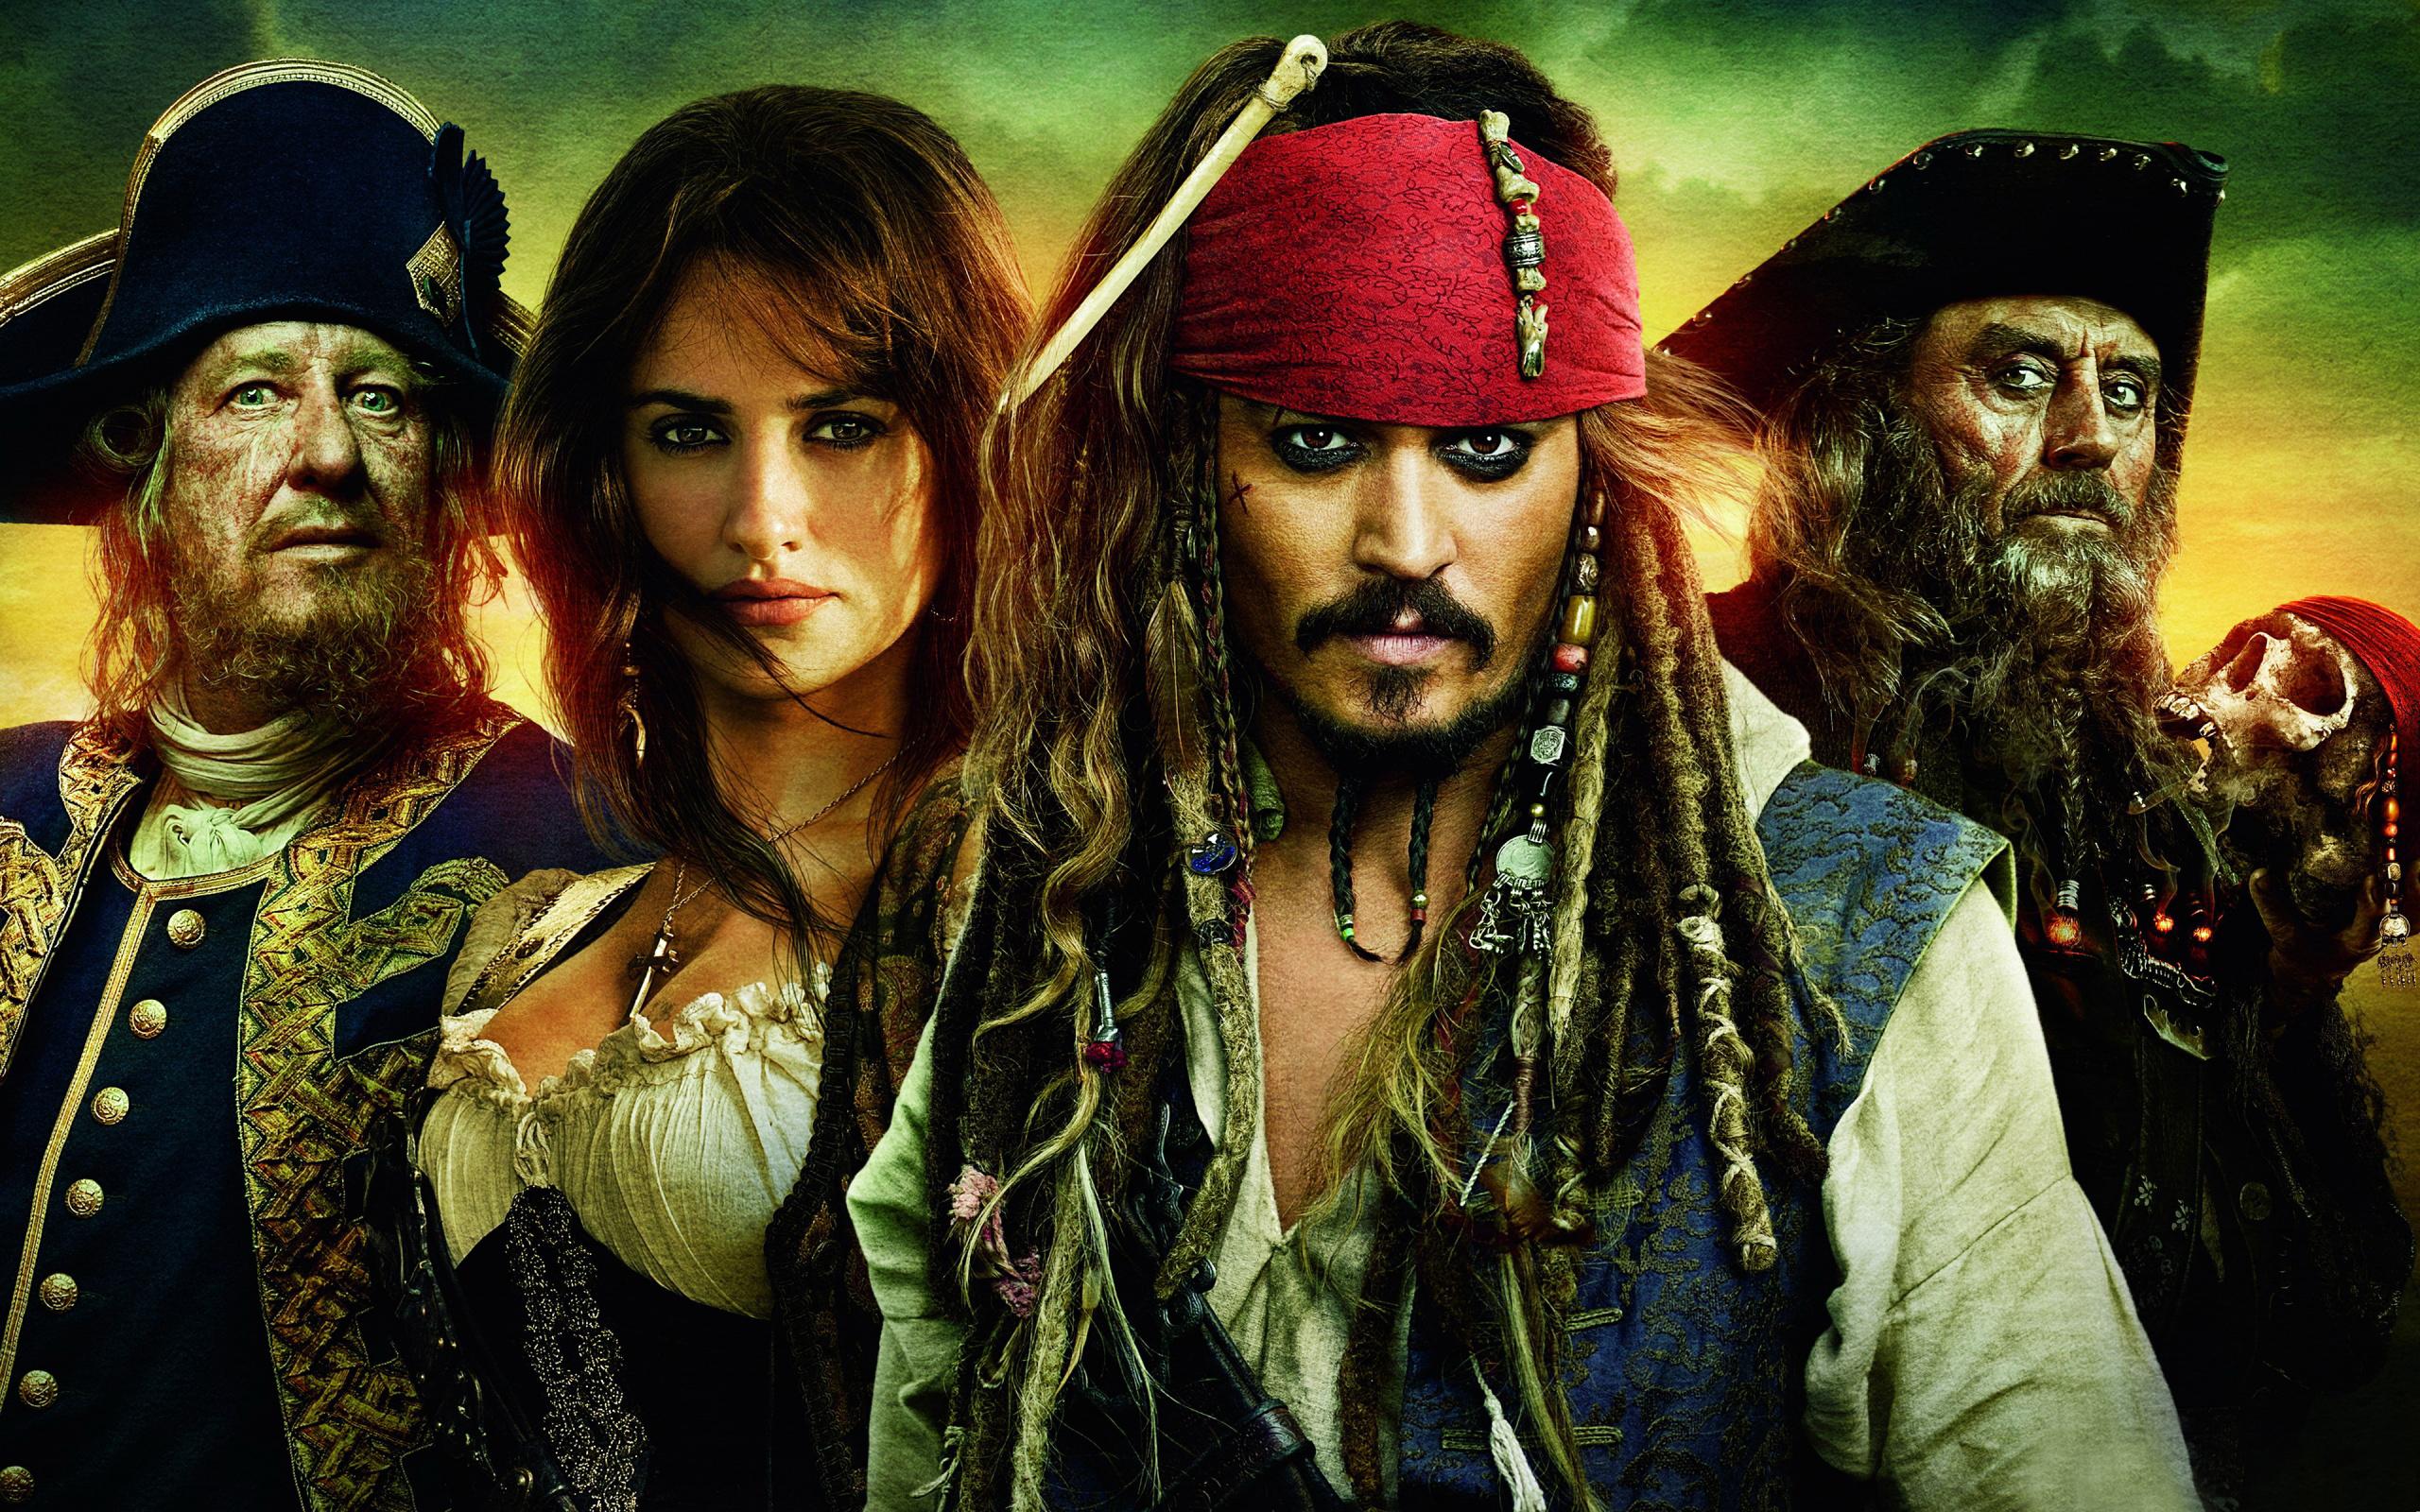 Pirates of the caribbean | desktop backgrounds.